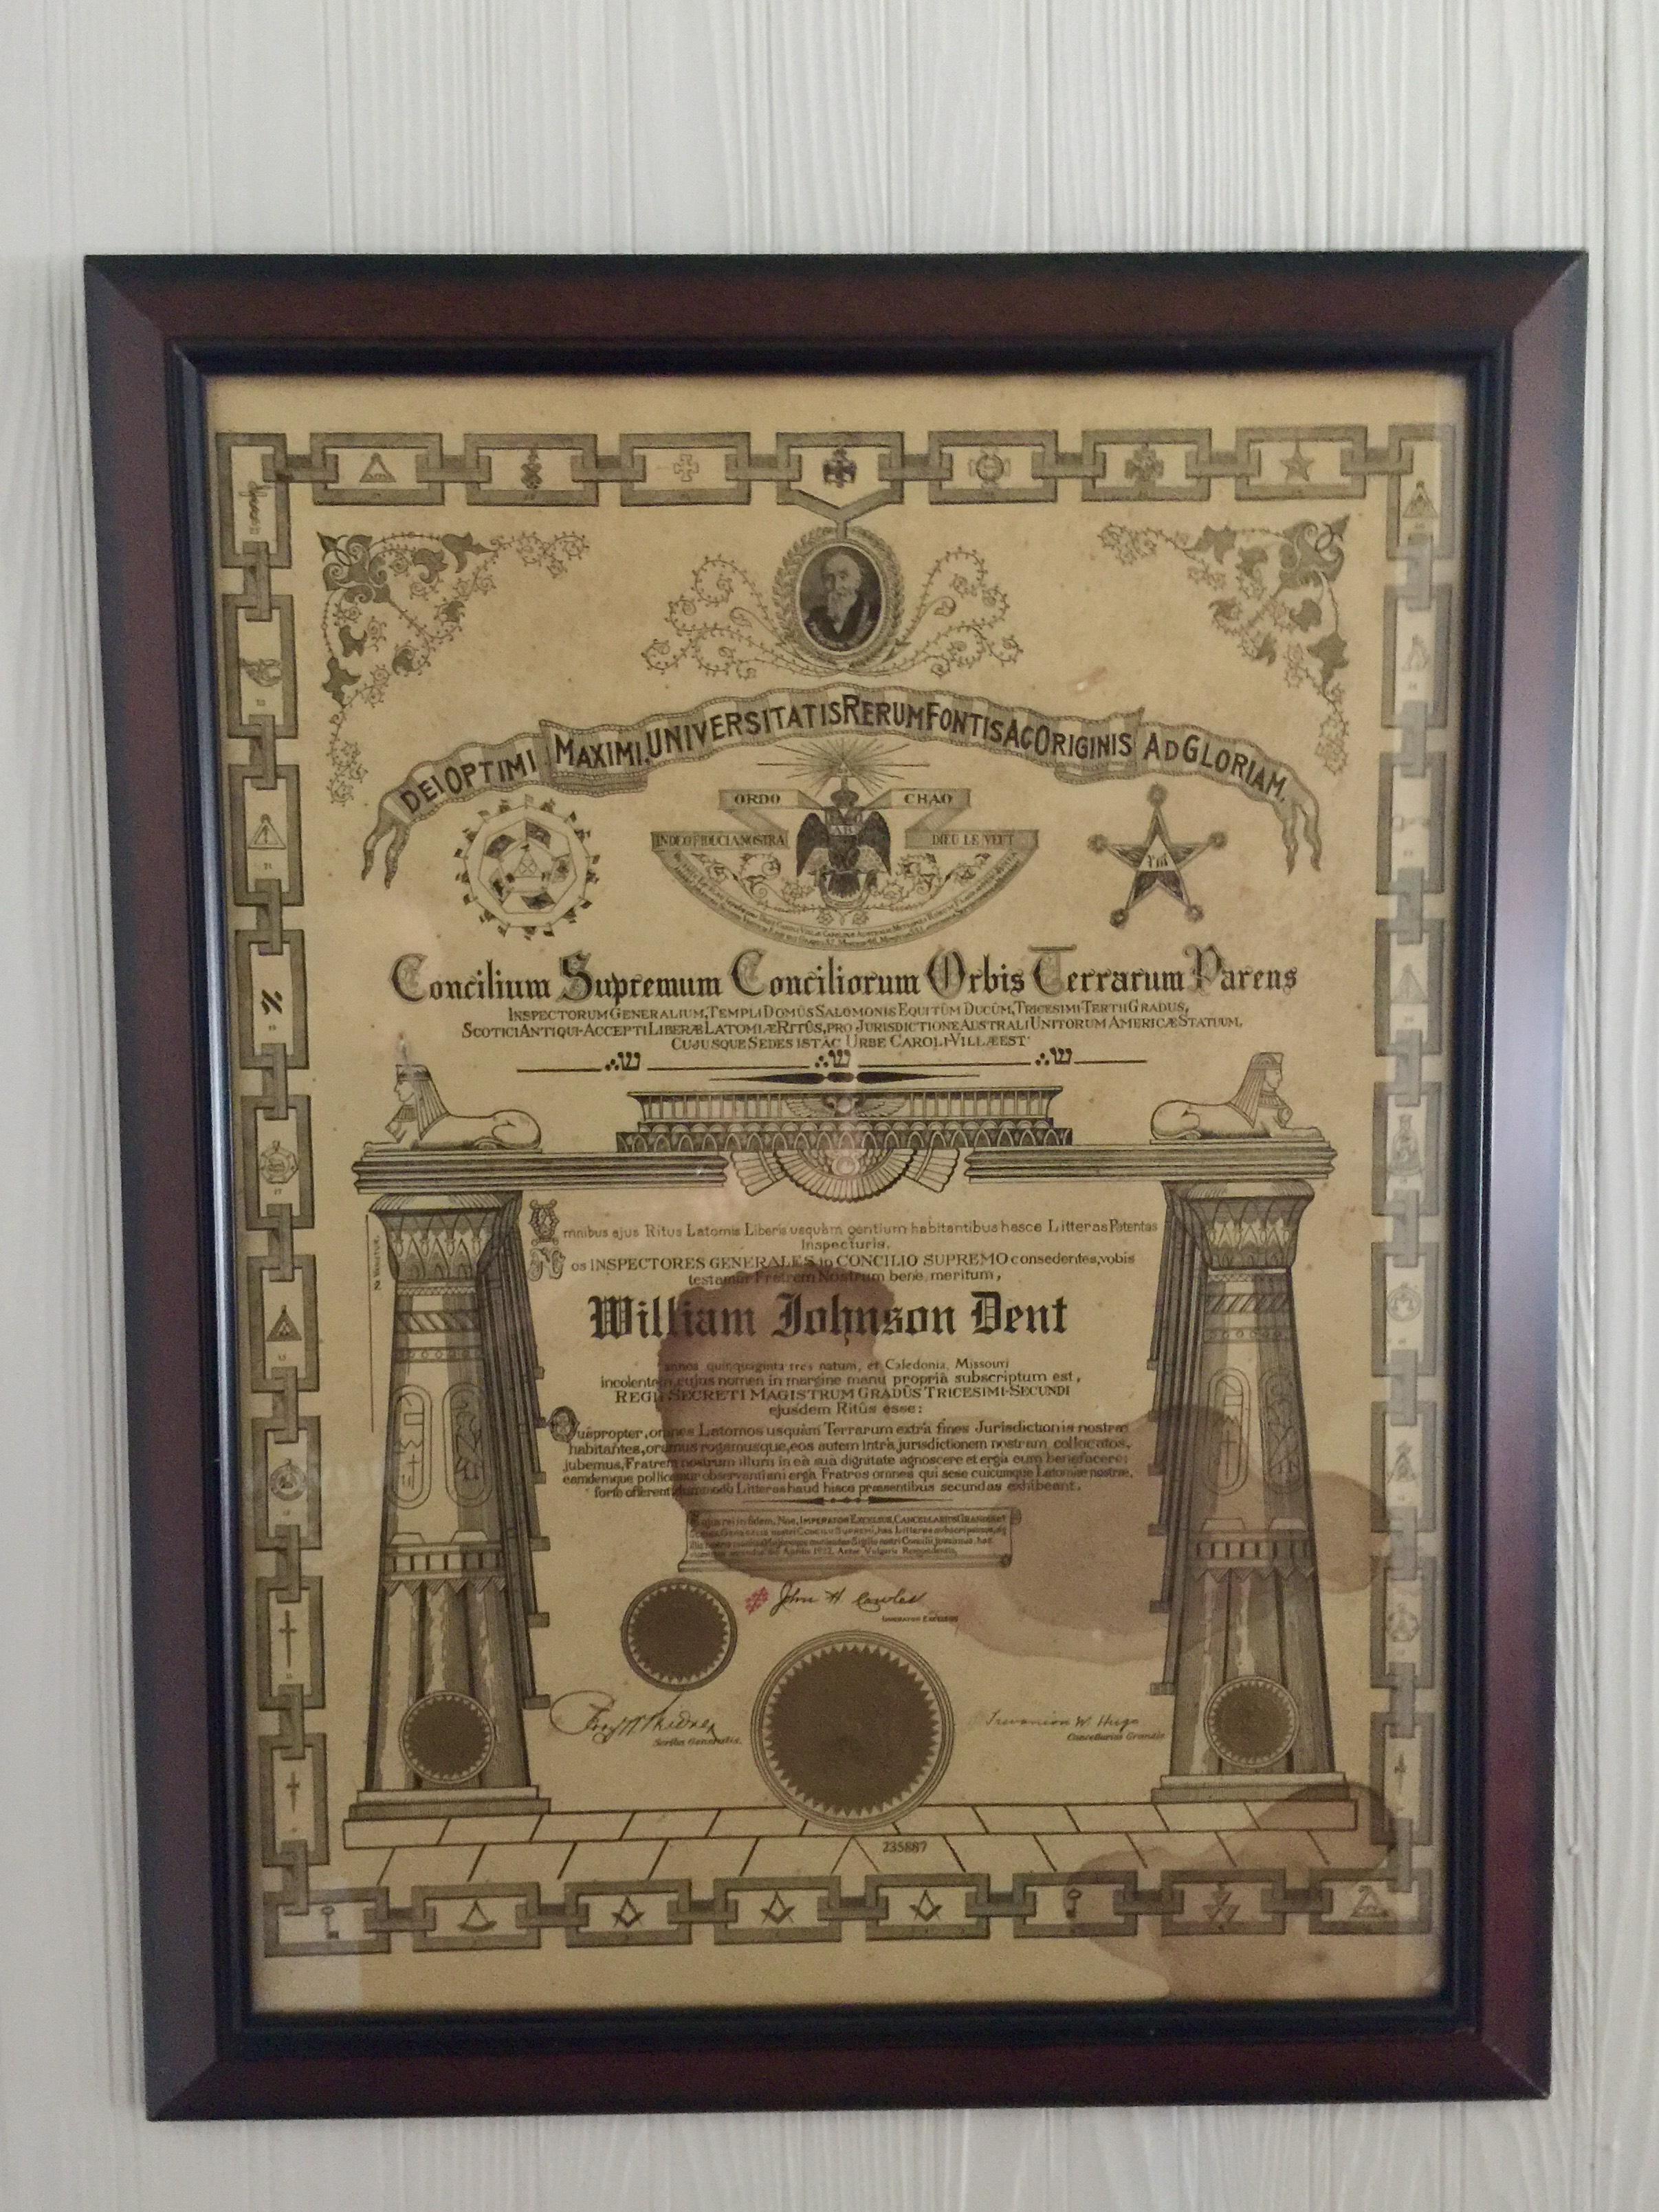 W.J.'s Masonic certificate.